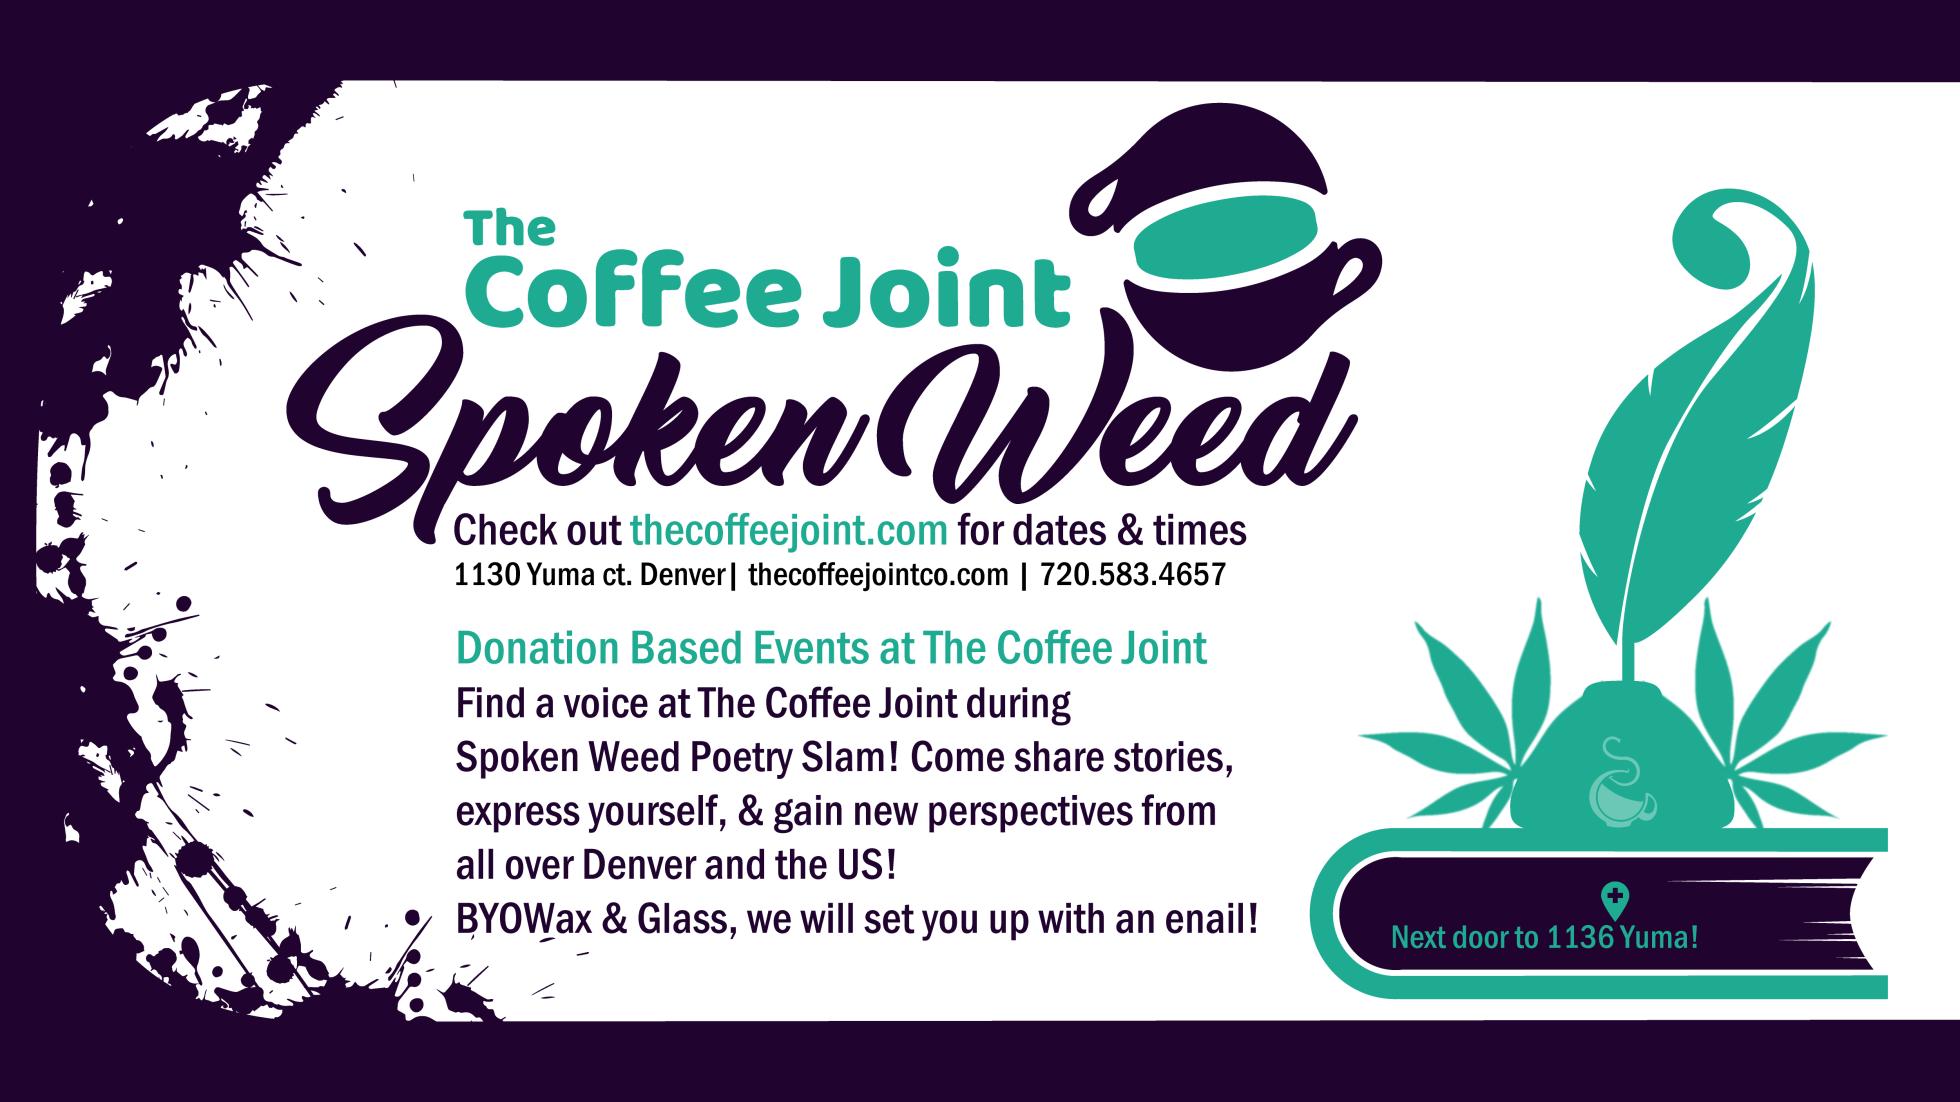 Spoken Weed!